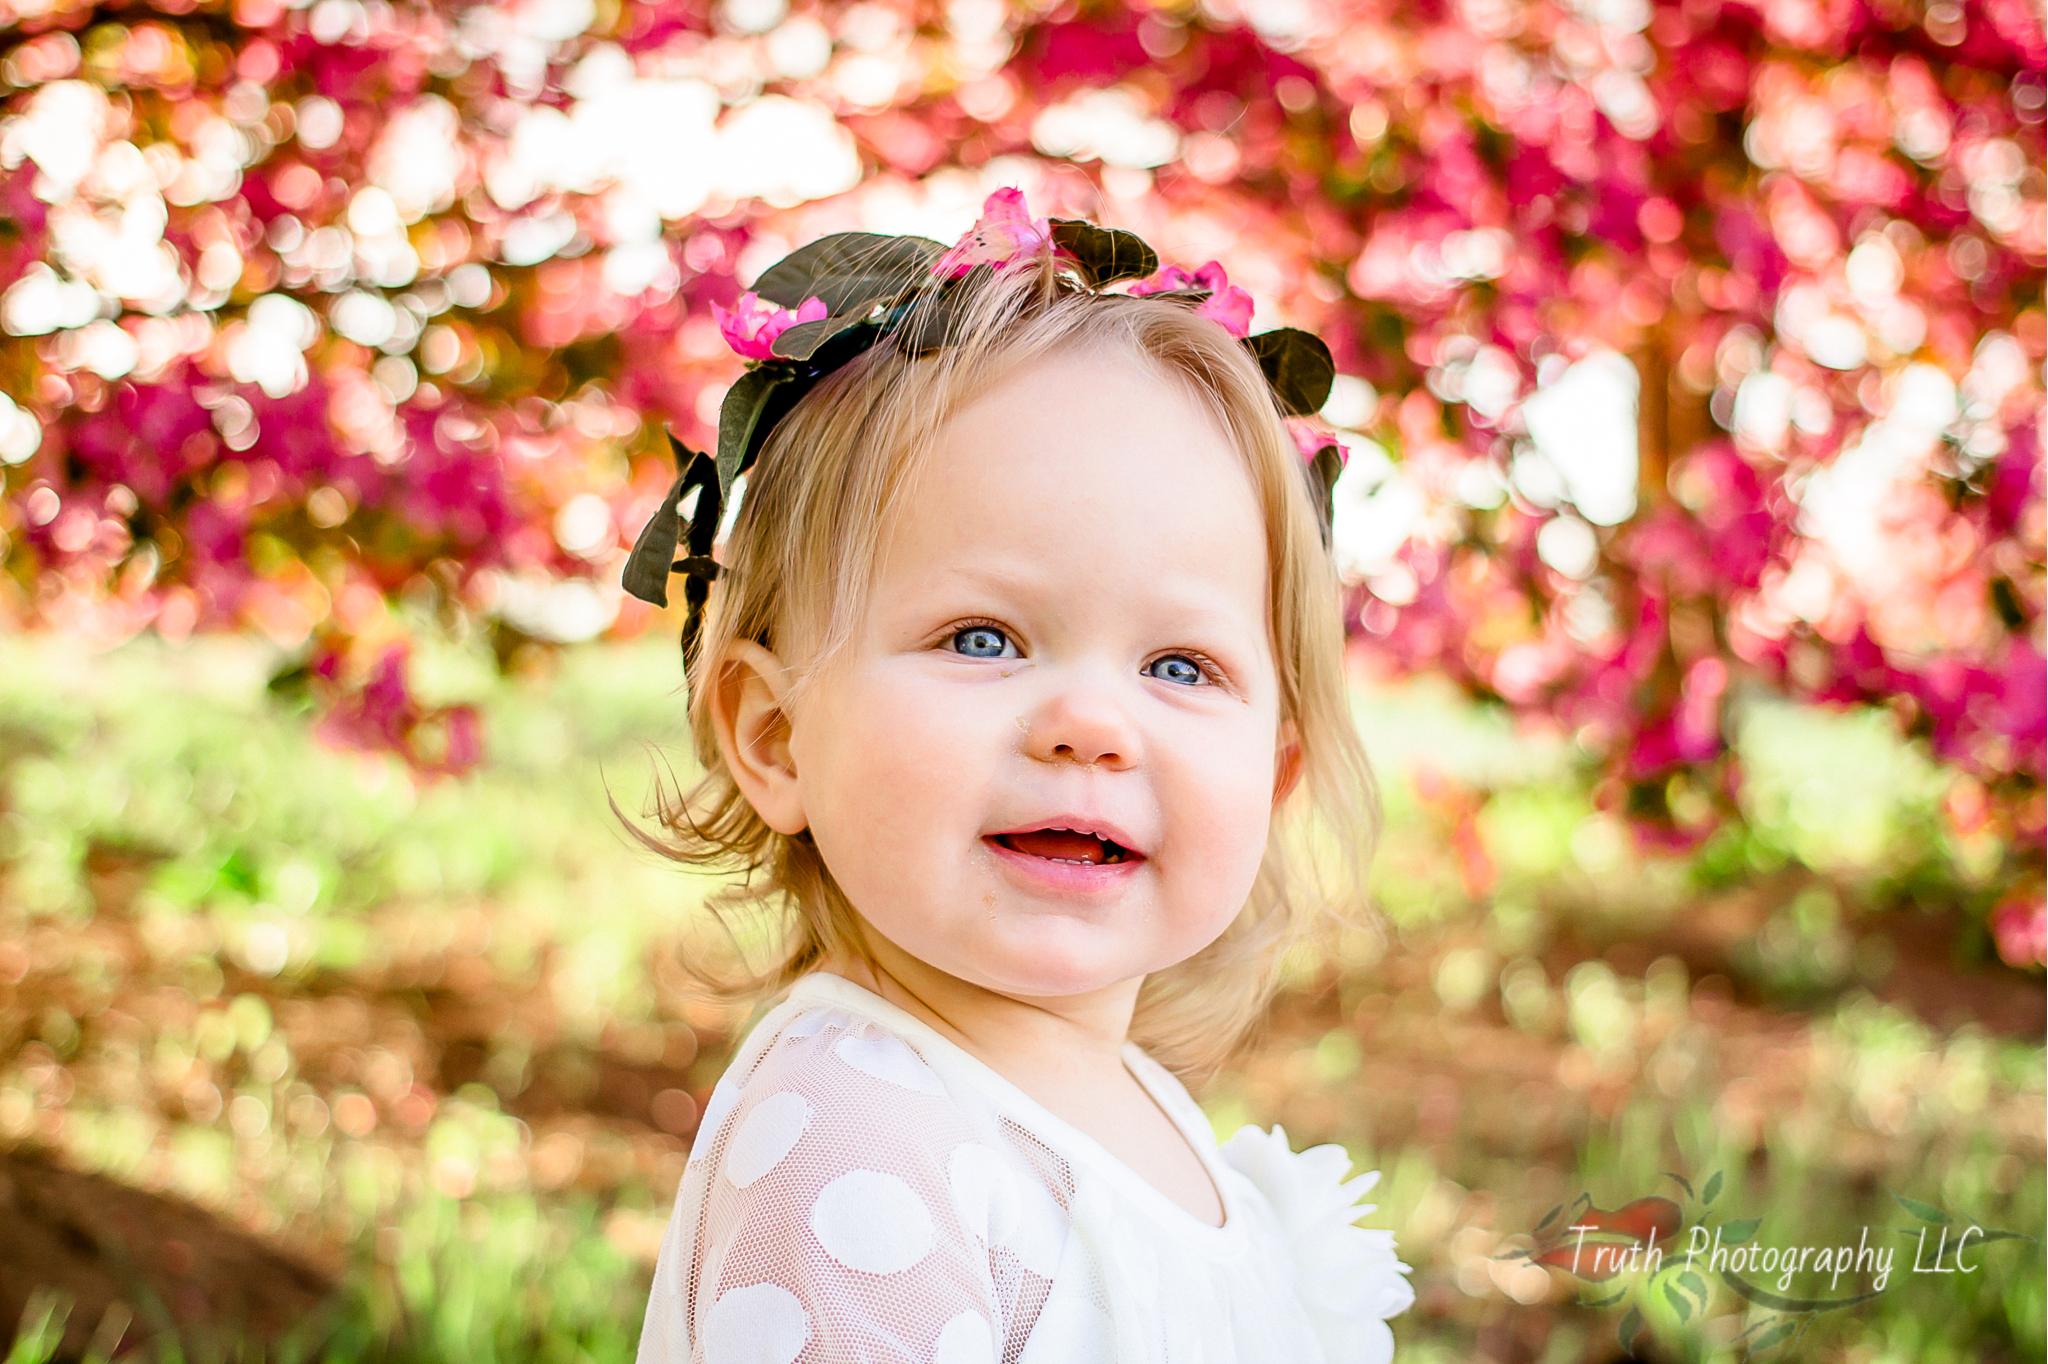 Truth-Photography-Northglenn-Children's-photographers.jpg